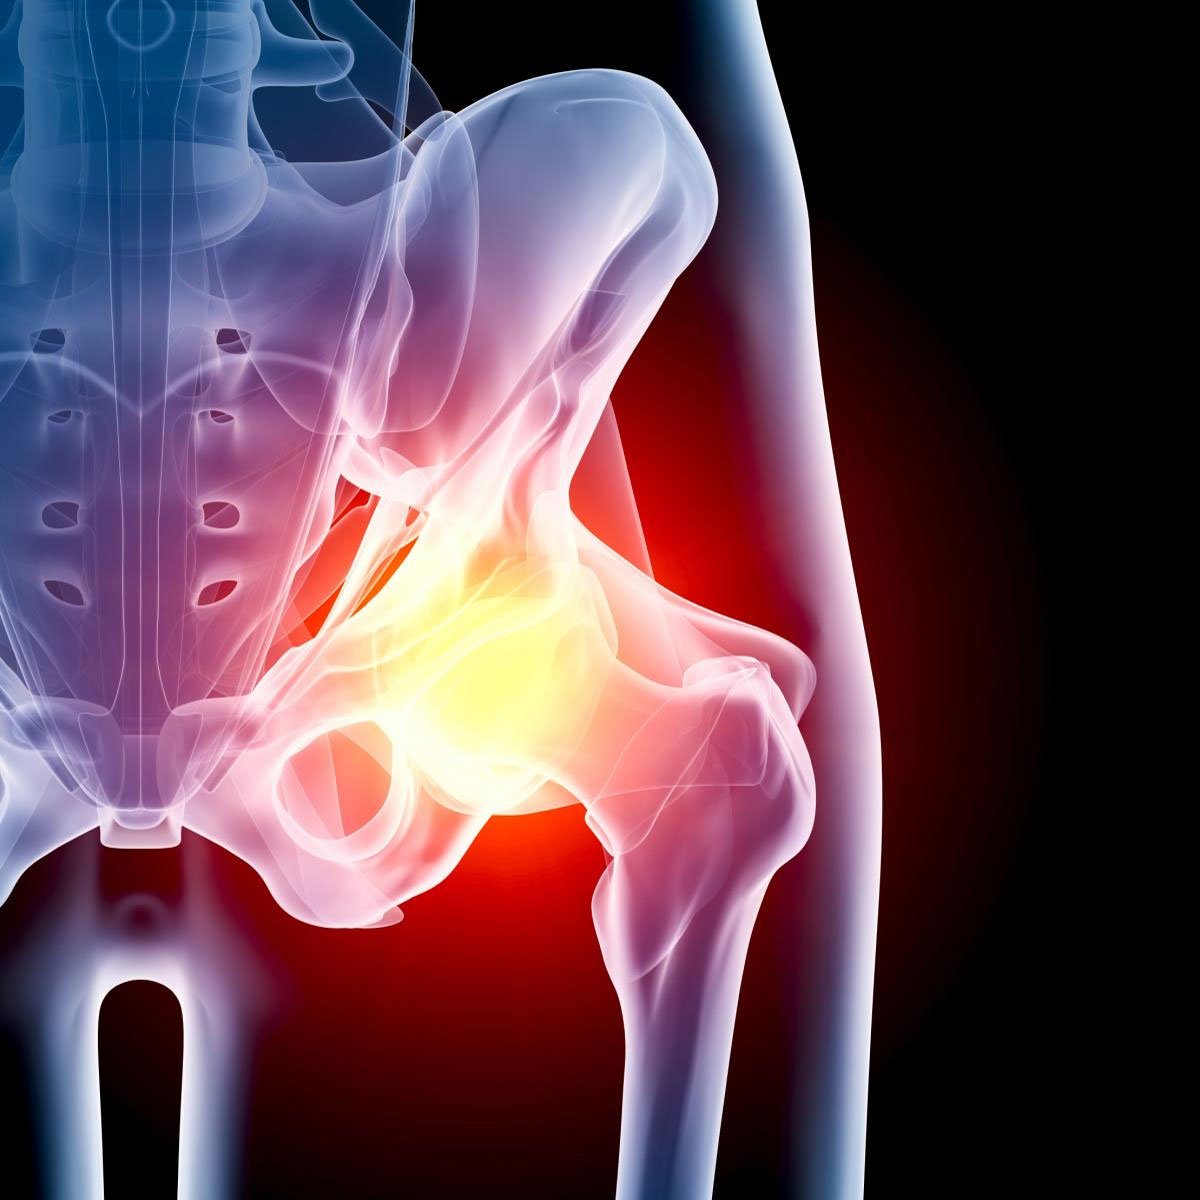 Остеохондроз боли тазобедренного сустава лечение